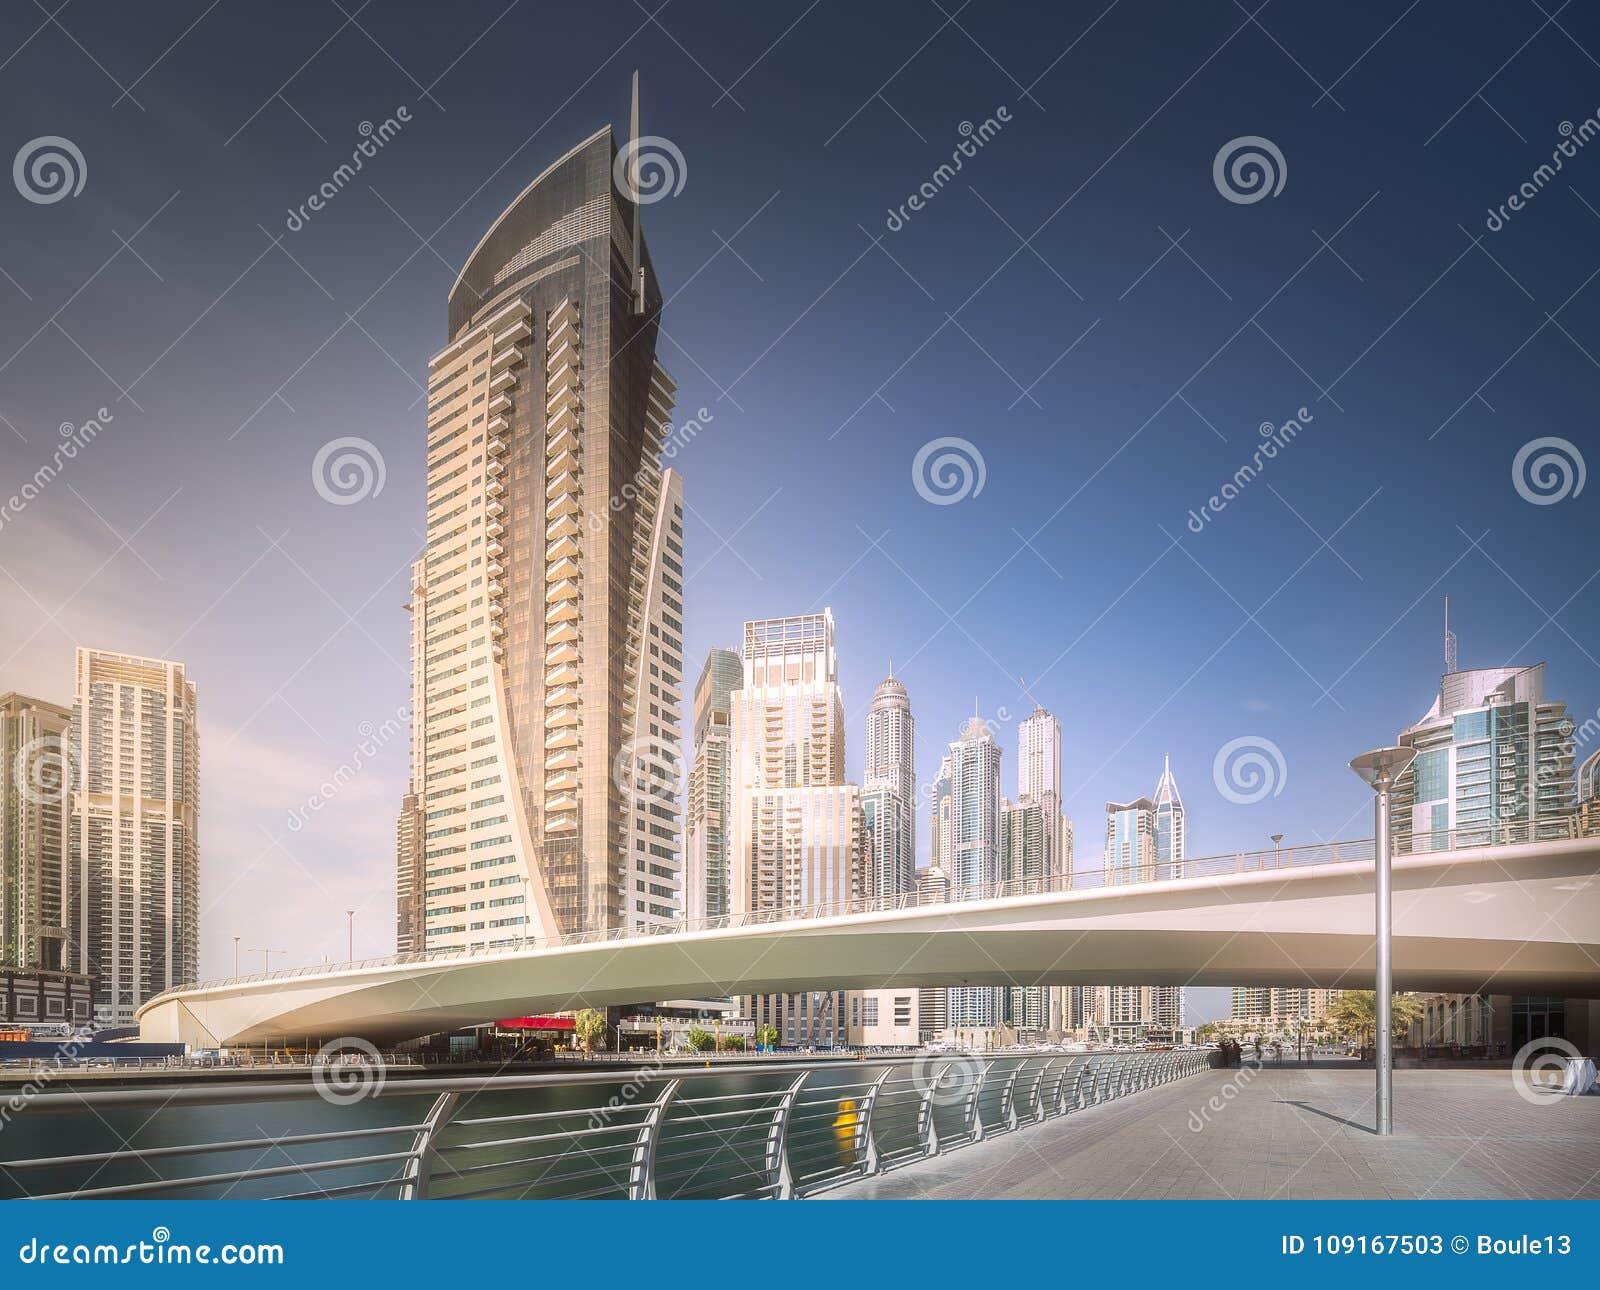 Day view of Dubai Marina bay with bridge, UAE